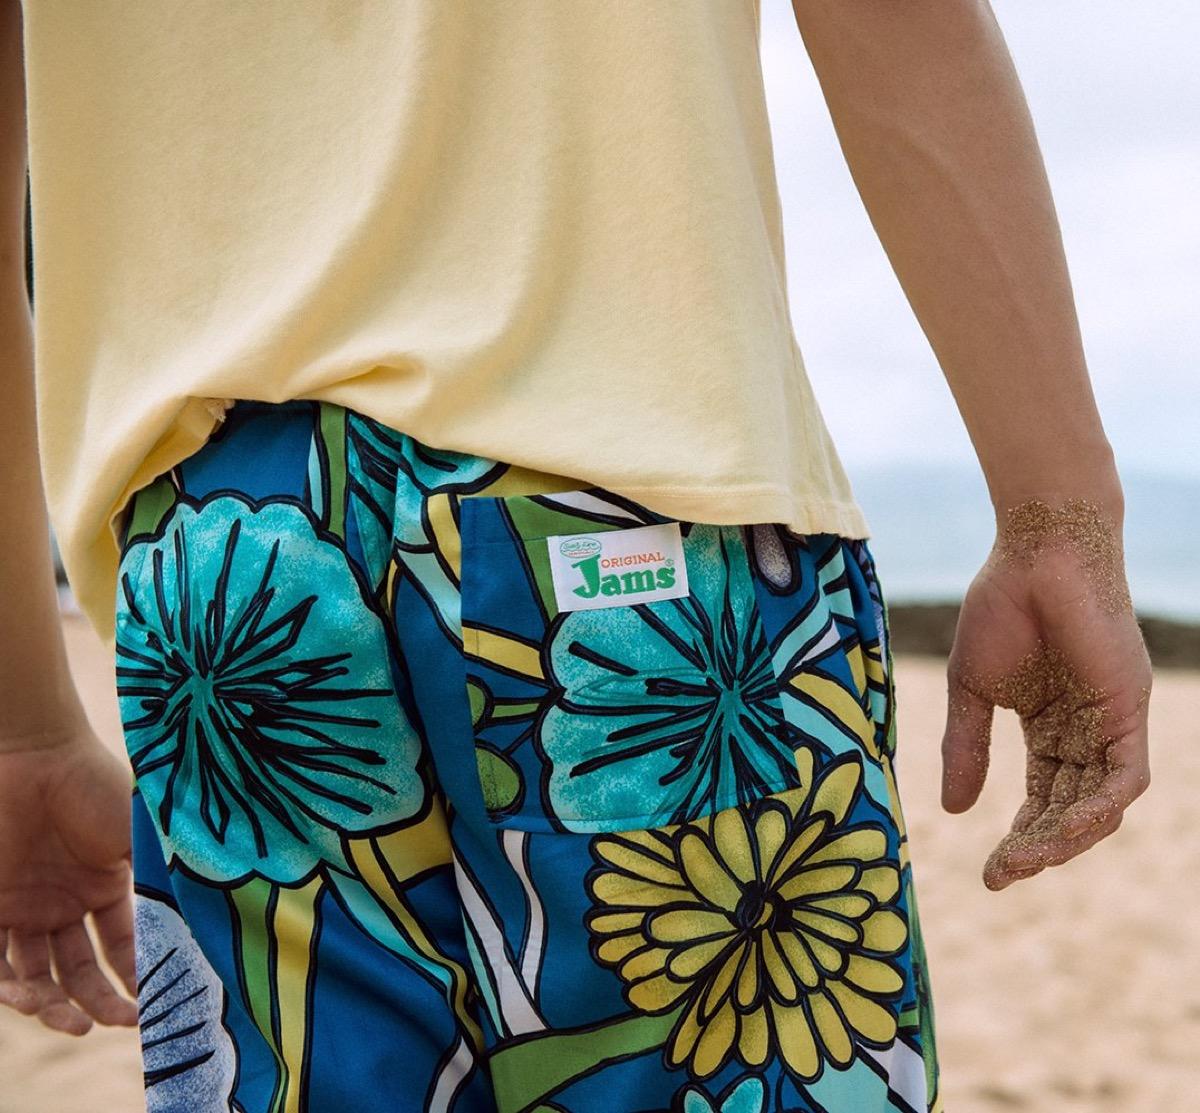 jams shorts'80s fashion